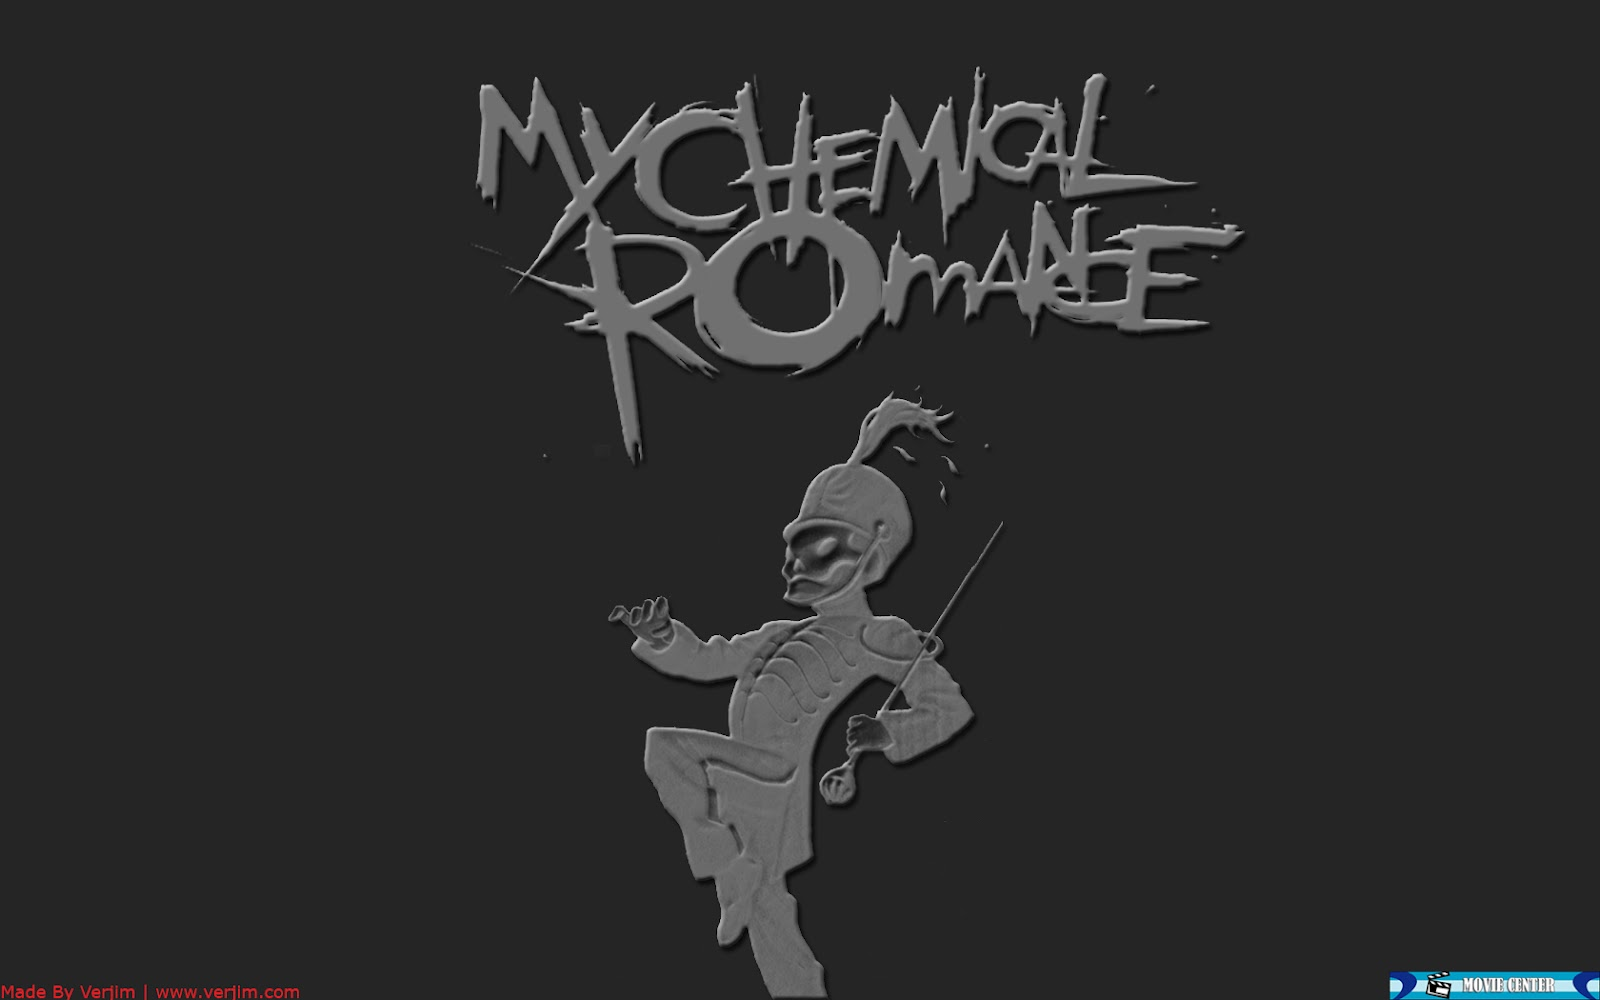 my chemical romance purevolume: